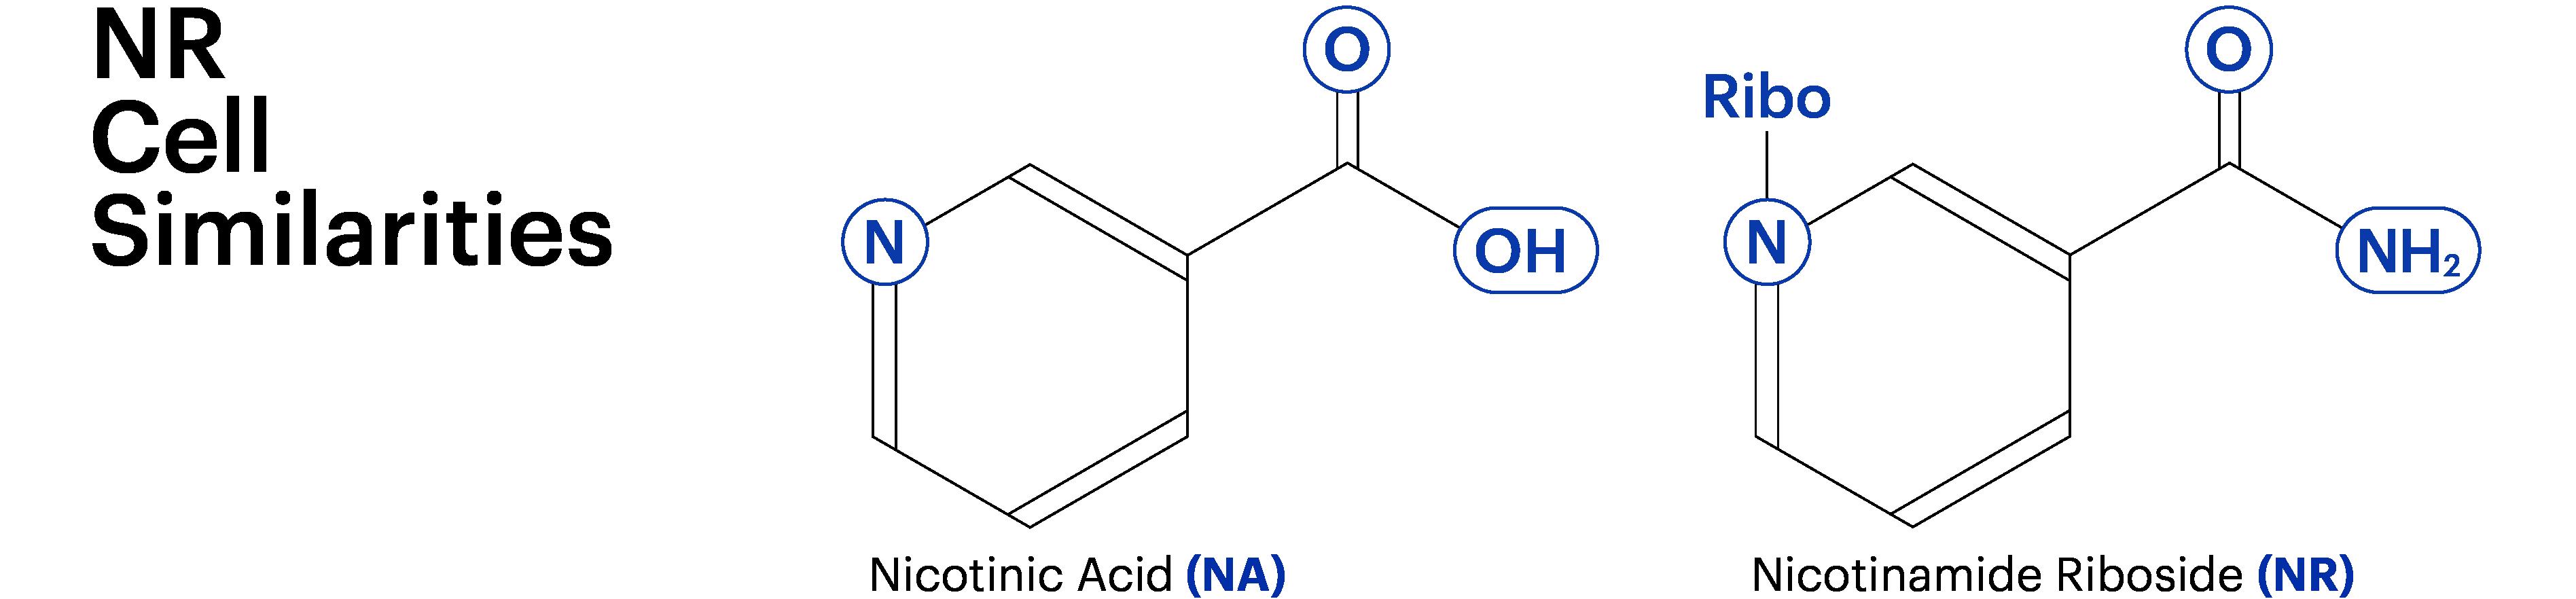 Nicotinamide Riboside: NR Benefits for Health and Aging